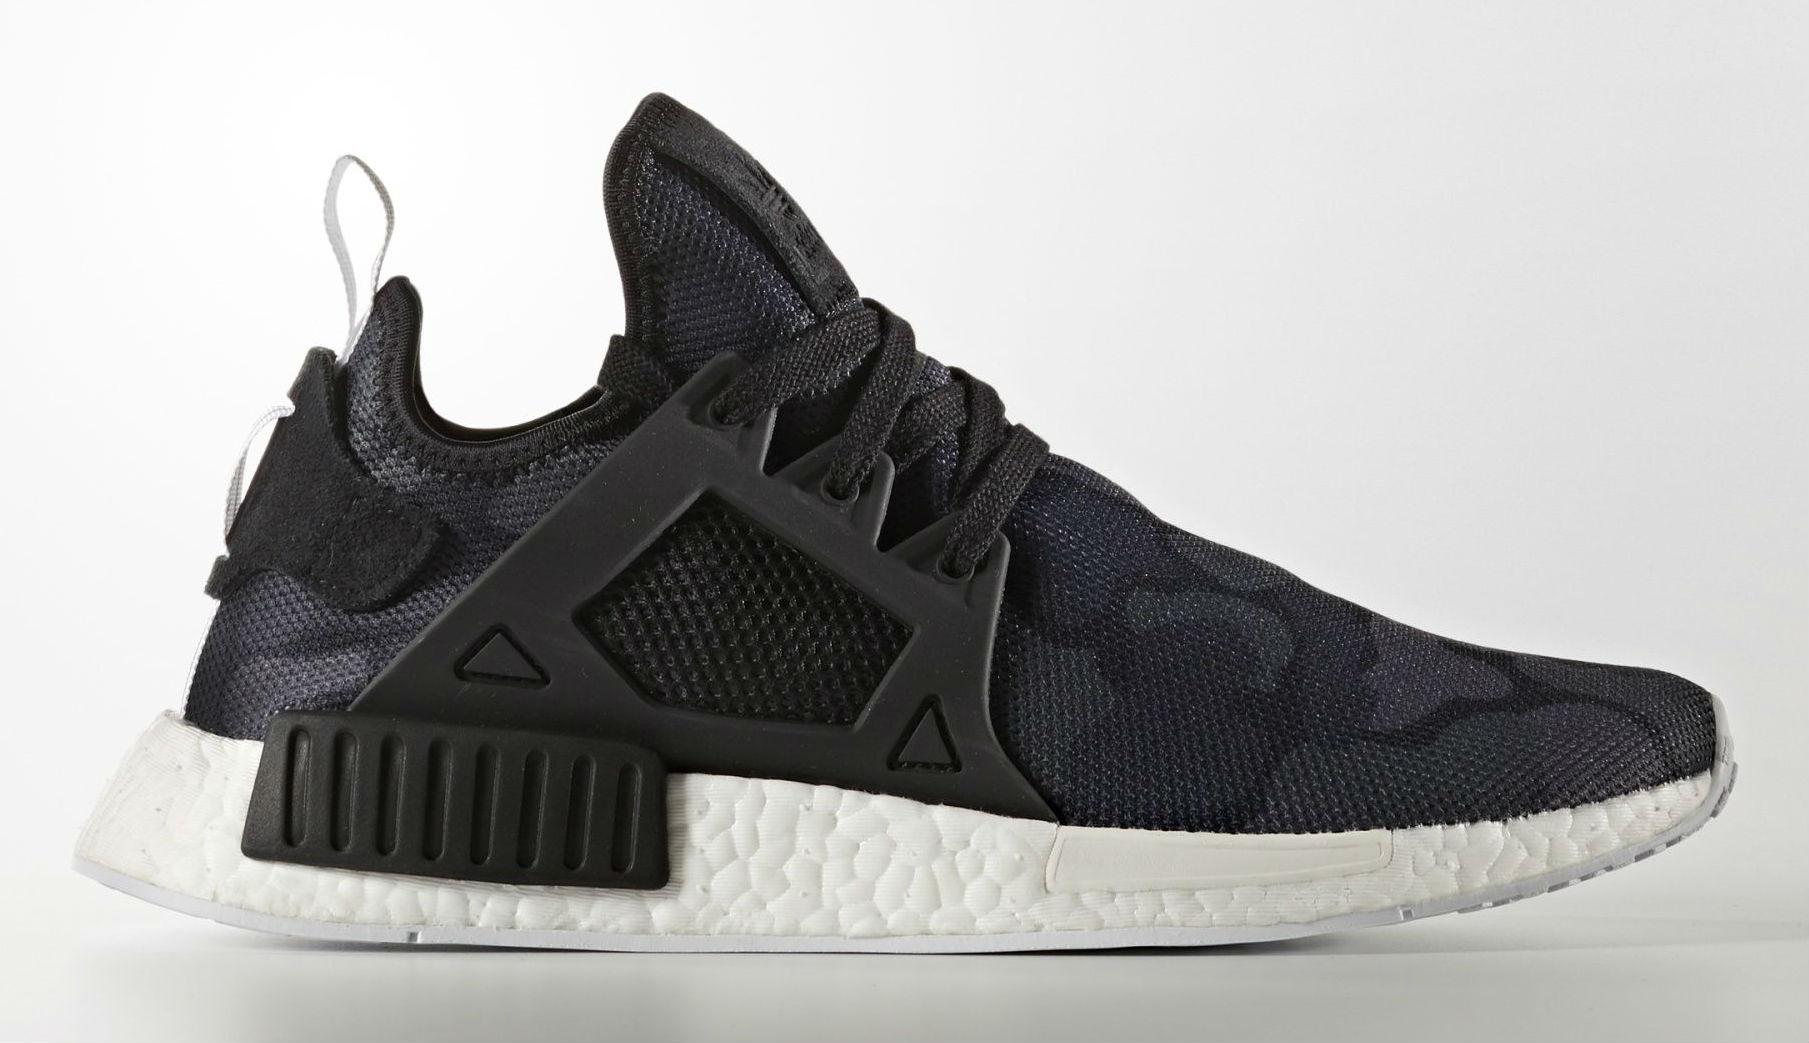 adidas nmd xr1 camo black 4_sd3mwr WearTesters